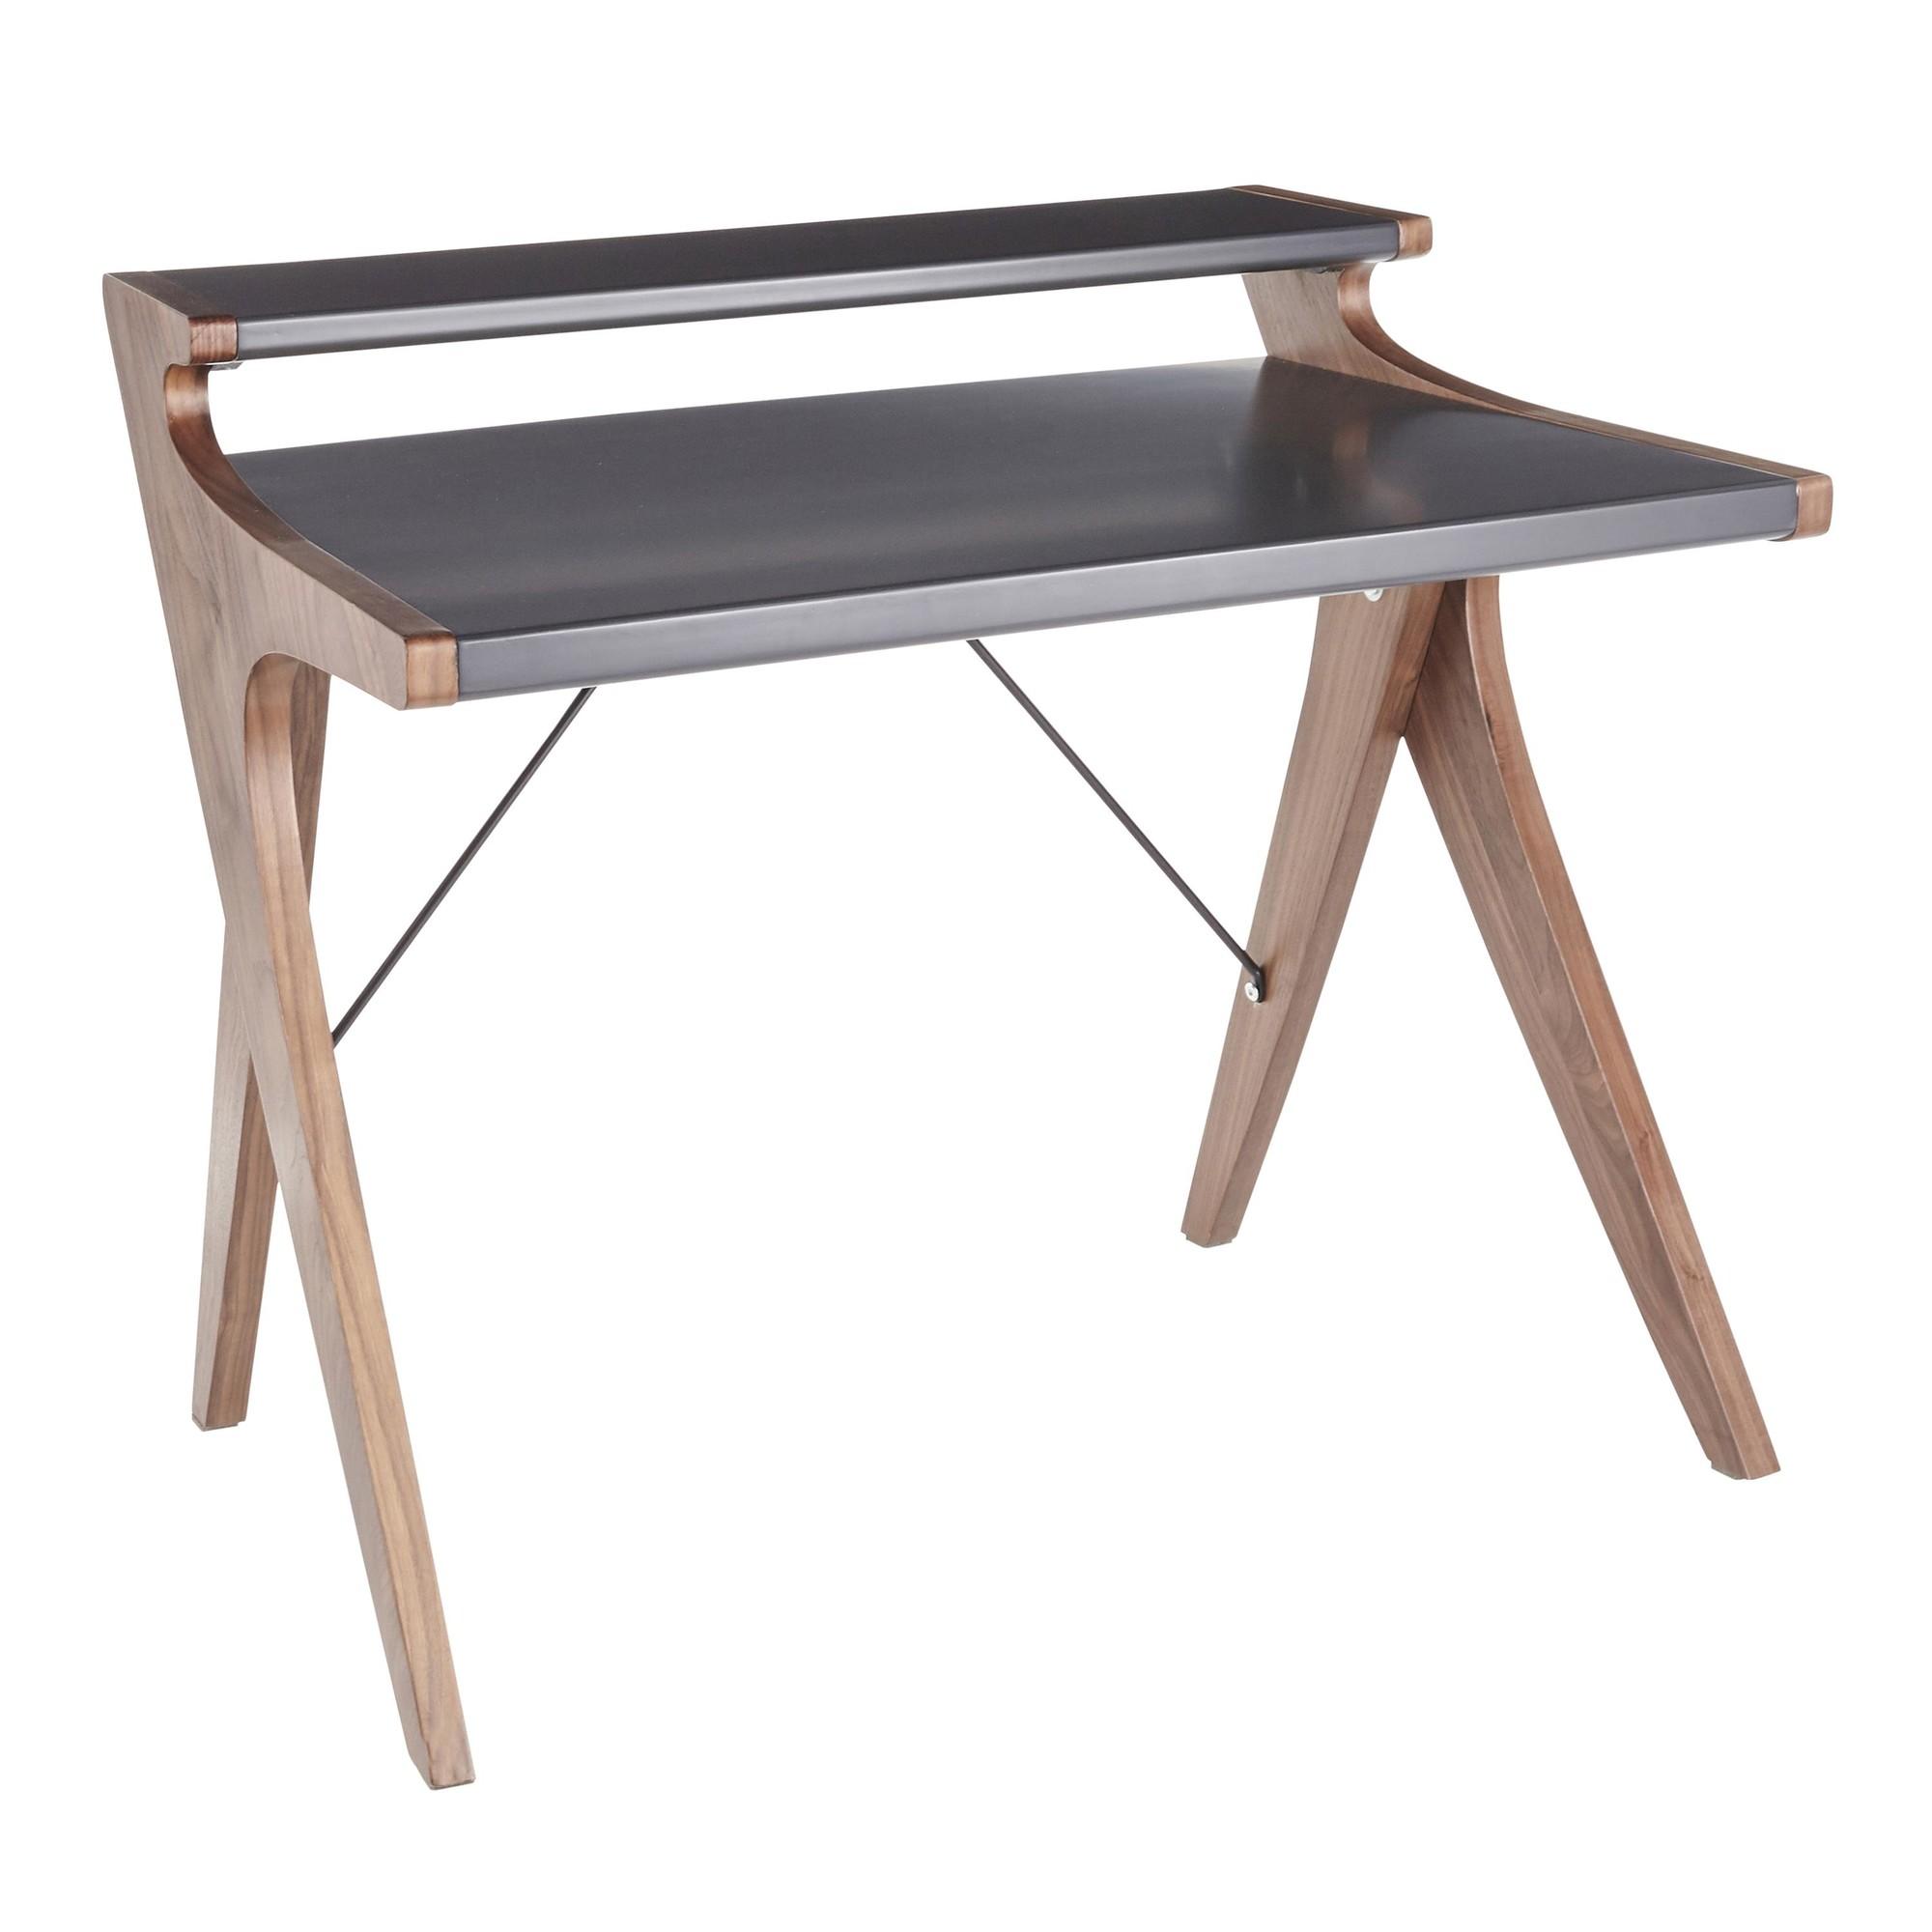 Archer Contemporary Desk in Walnut Wood w/ Grey Wood Top - Lumisource OFD-ARCHER WLGY